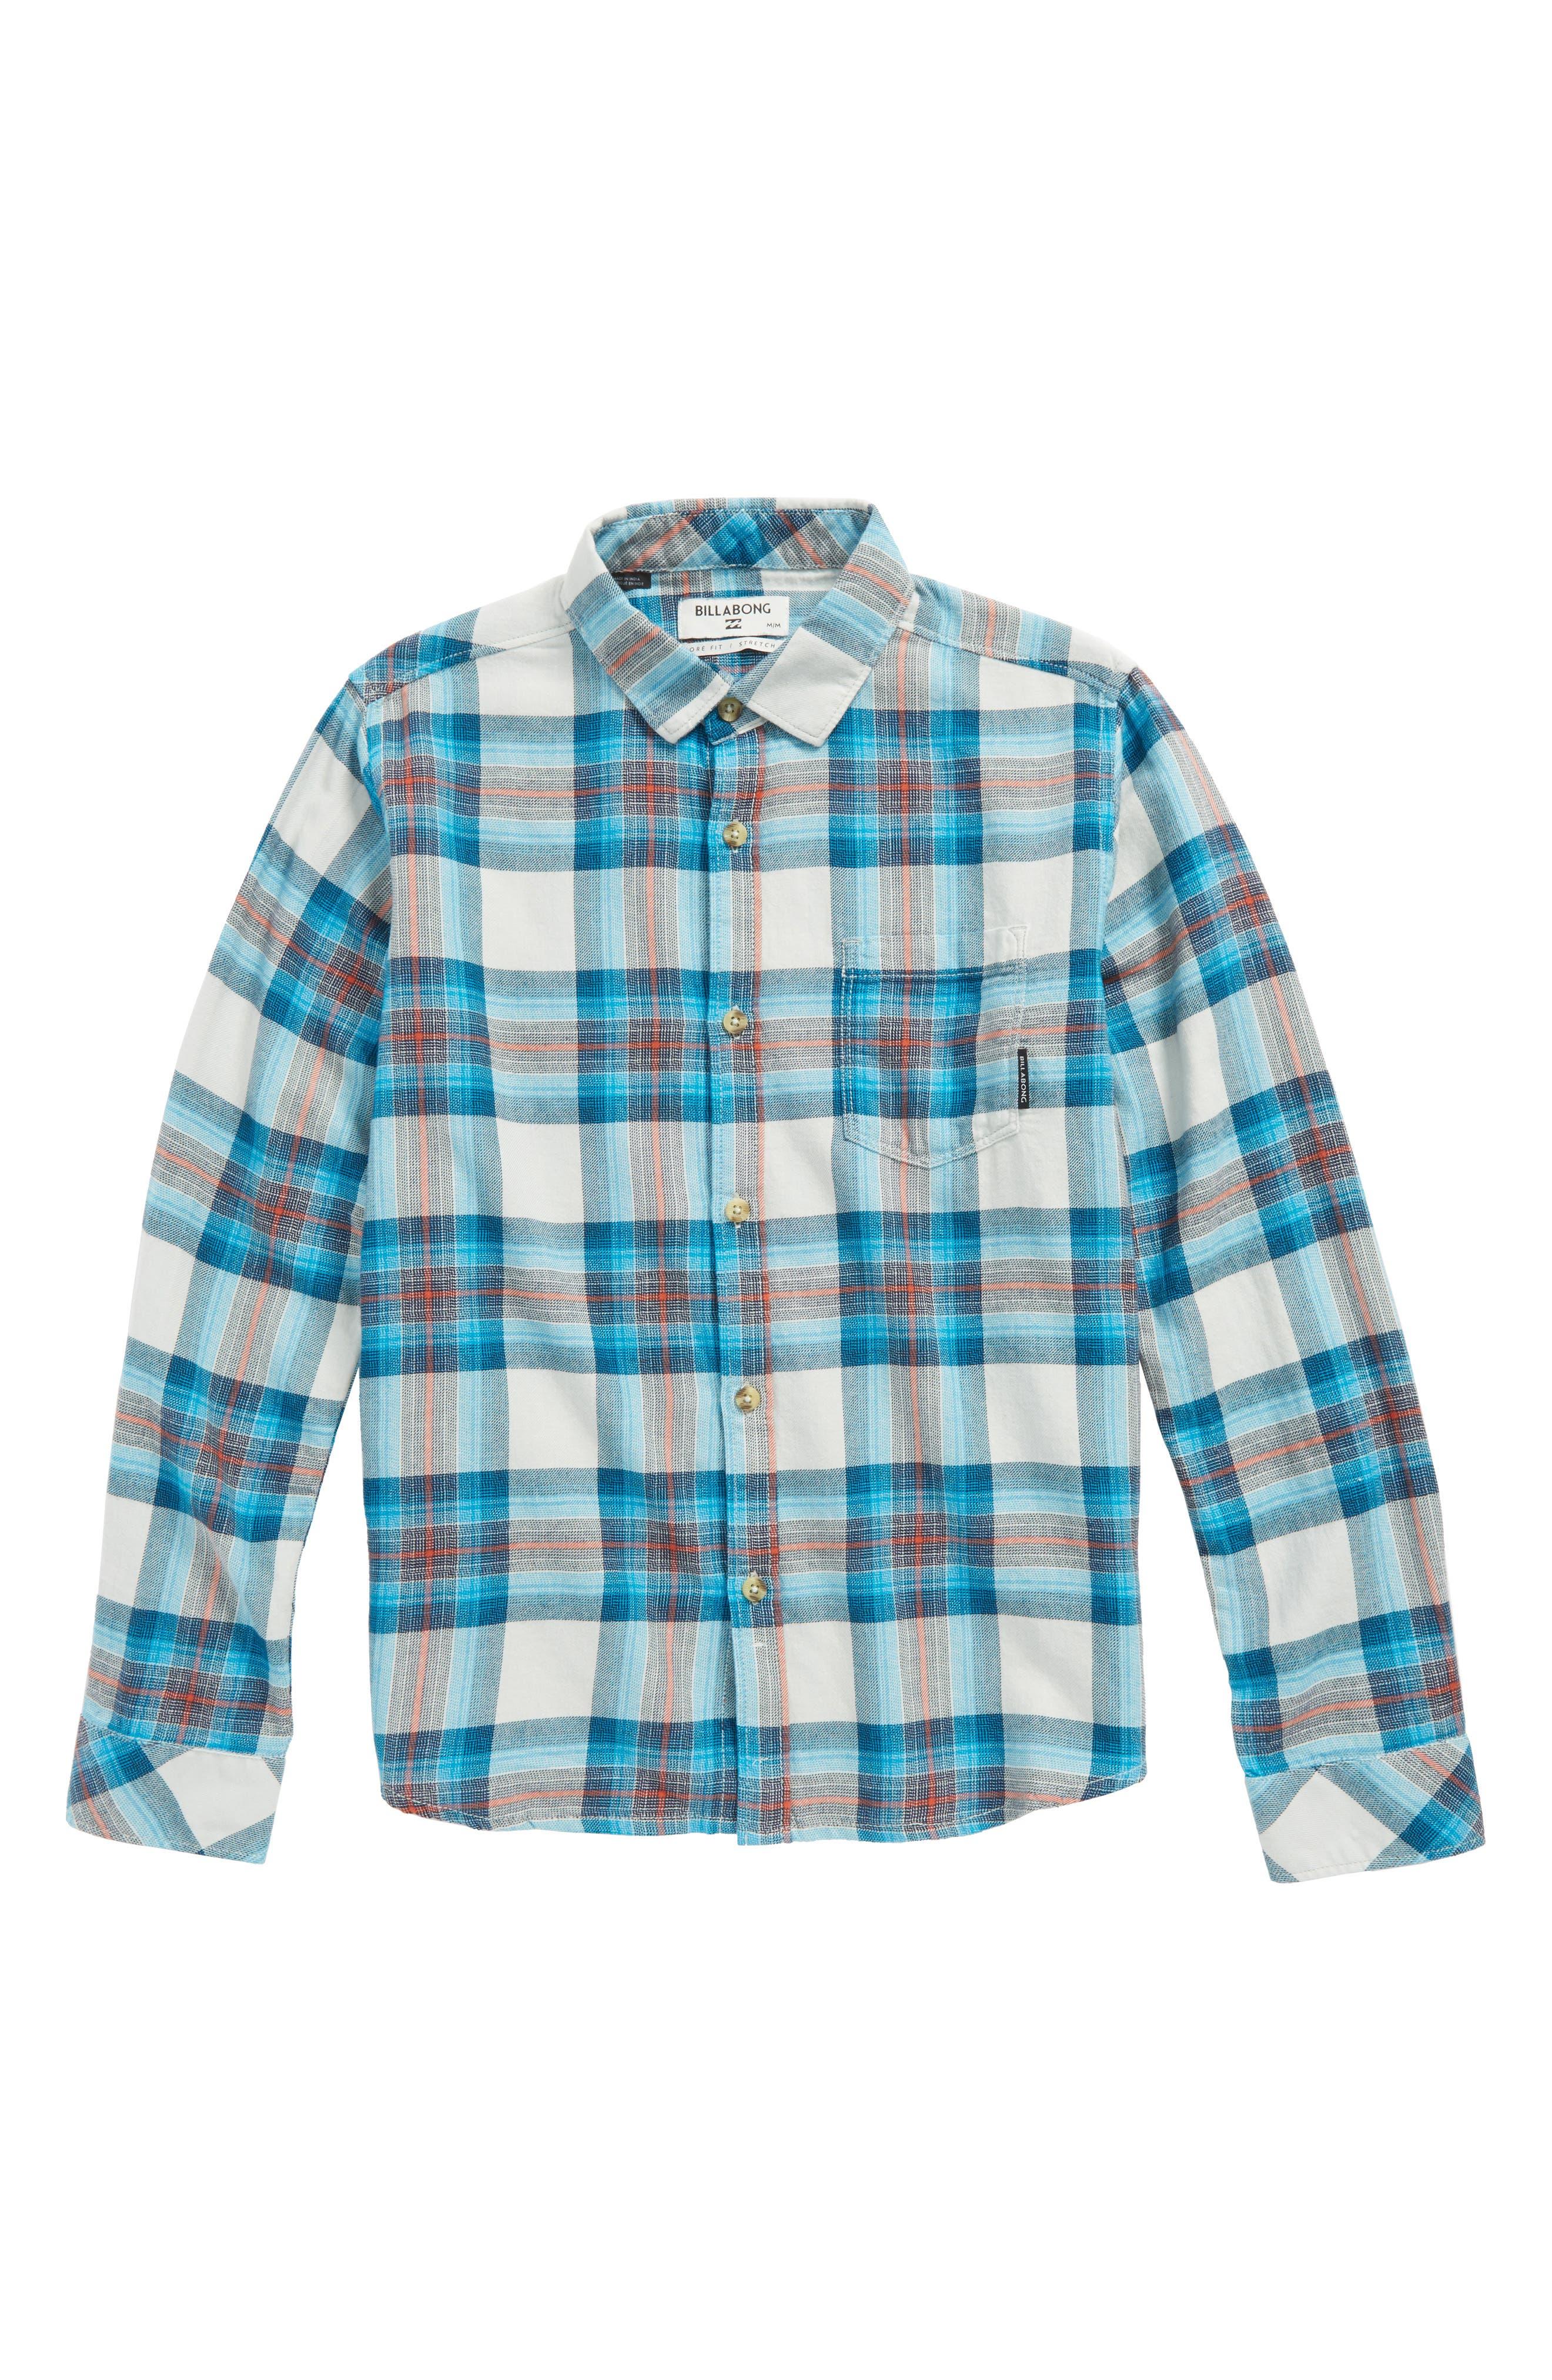 Freemont Plaid Flannel Shirt,                         Main,                         color, 020